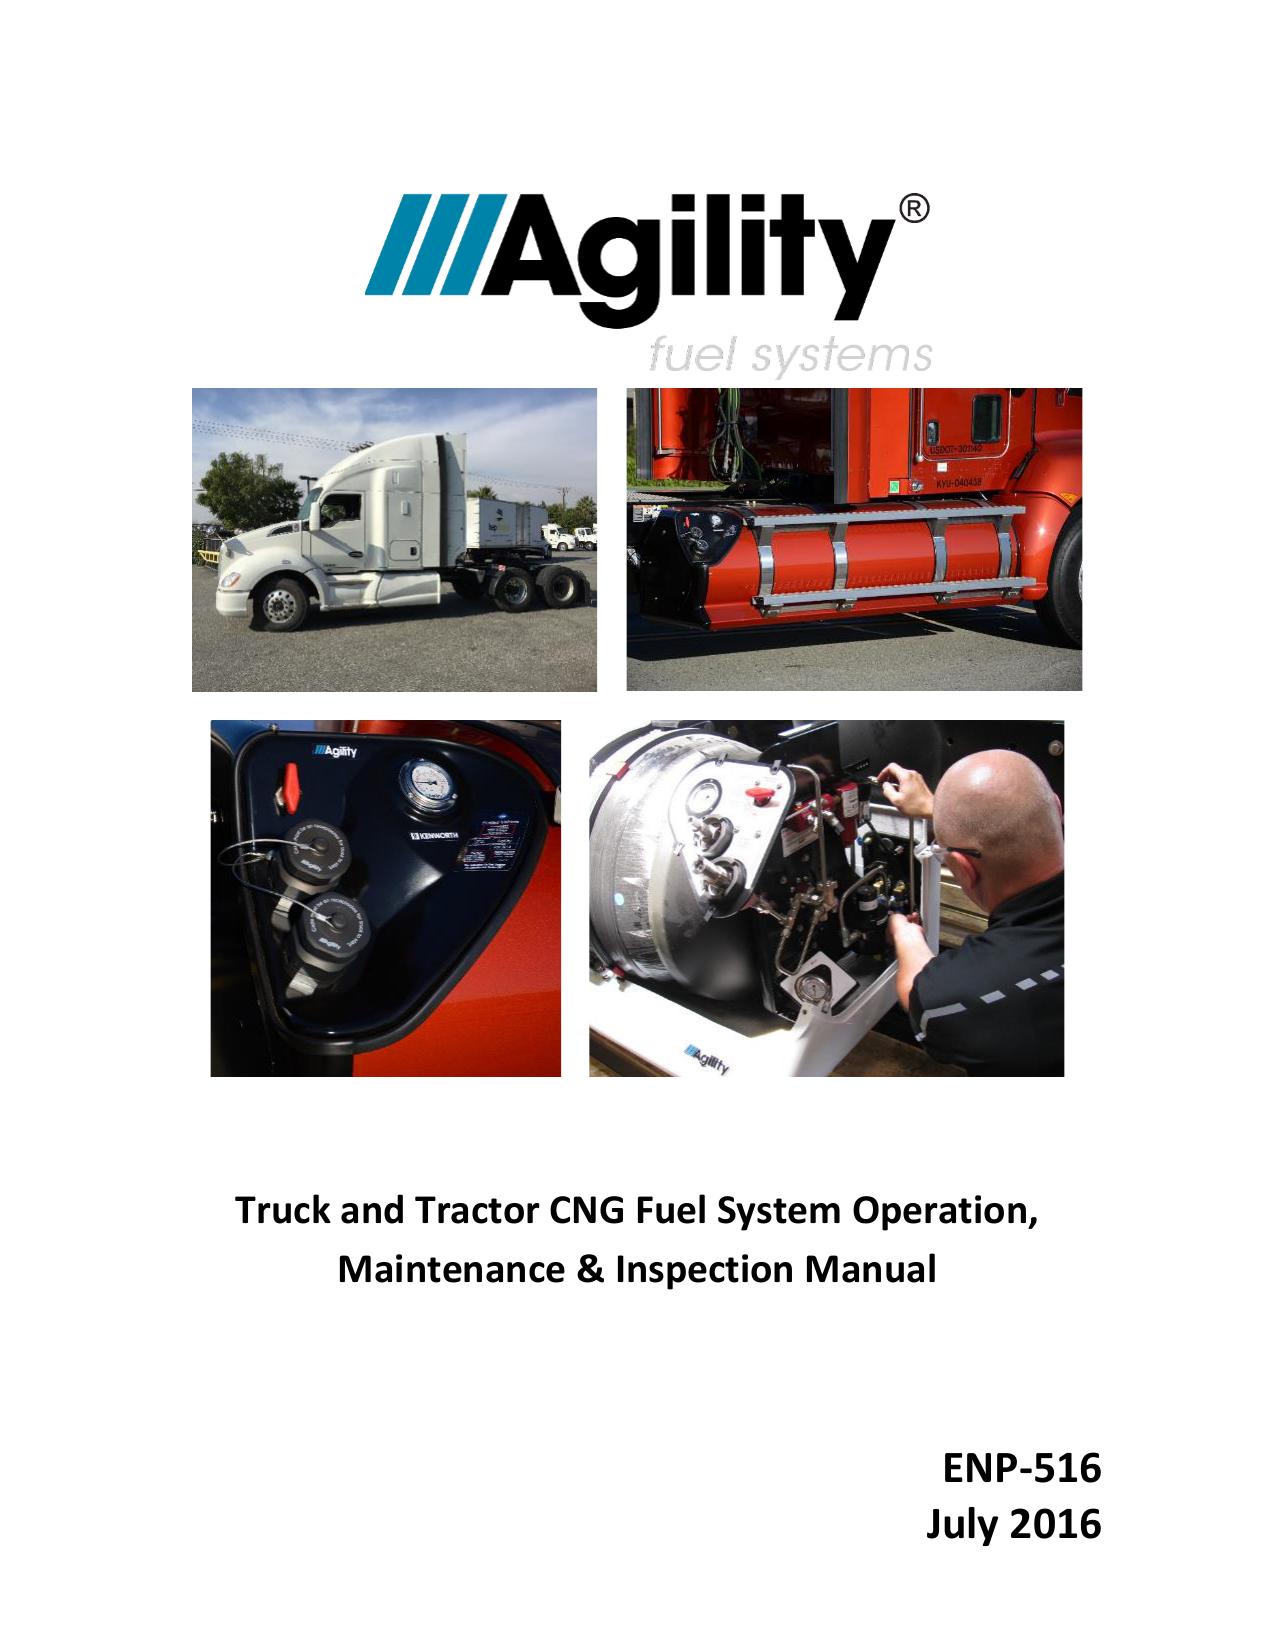 ENP-516 July 2016 - Agility Fuel Solutions | manualzz com